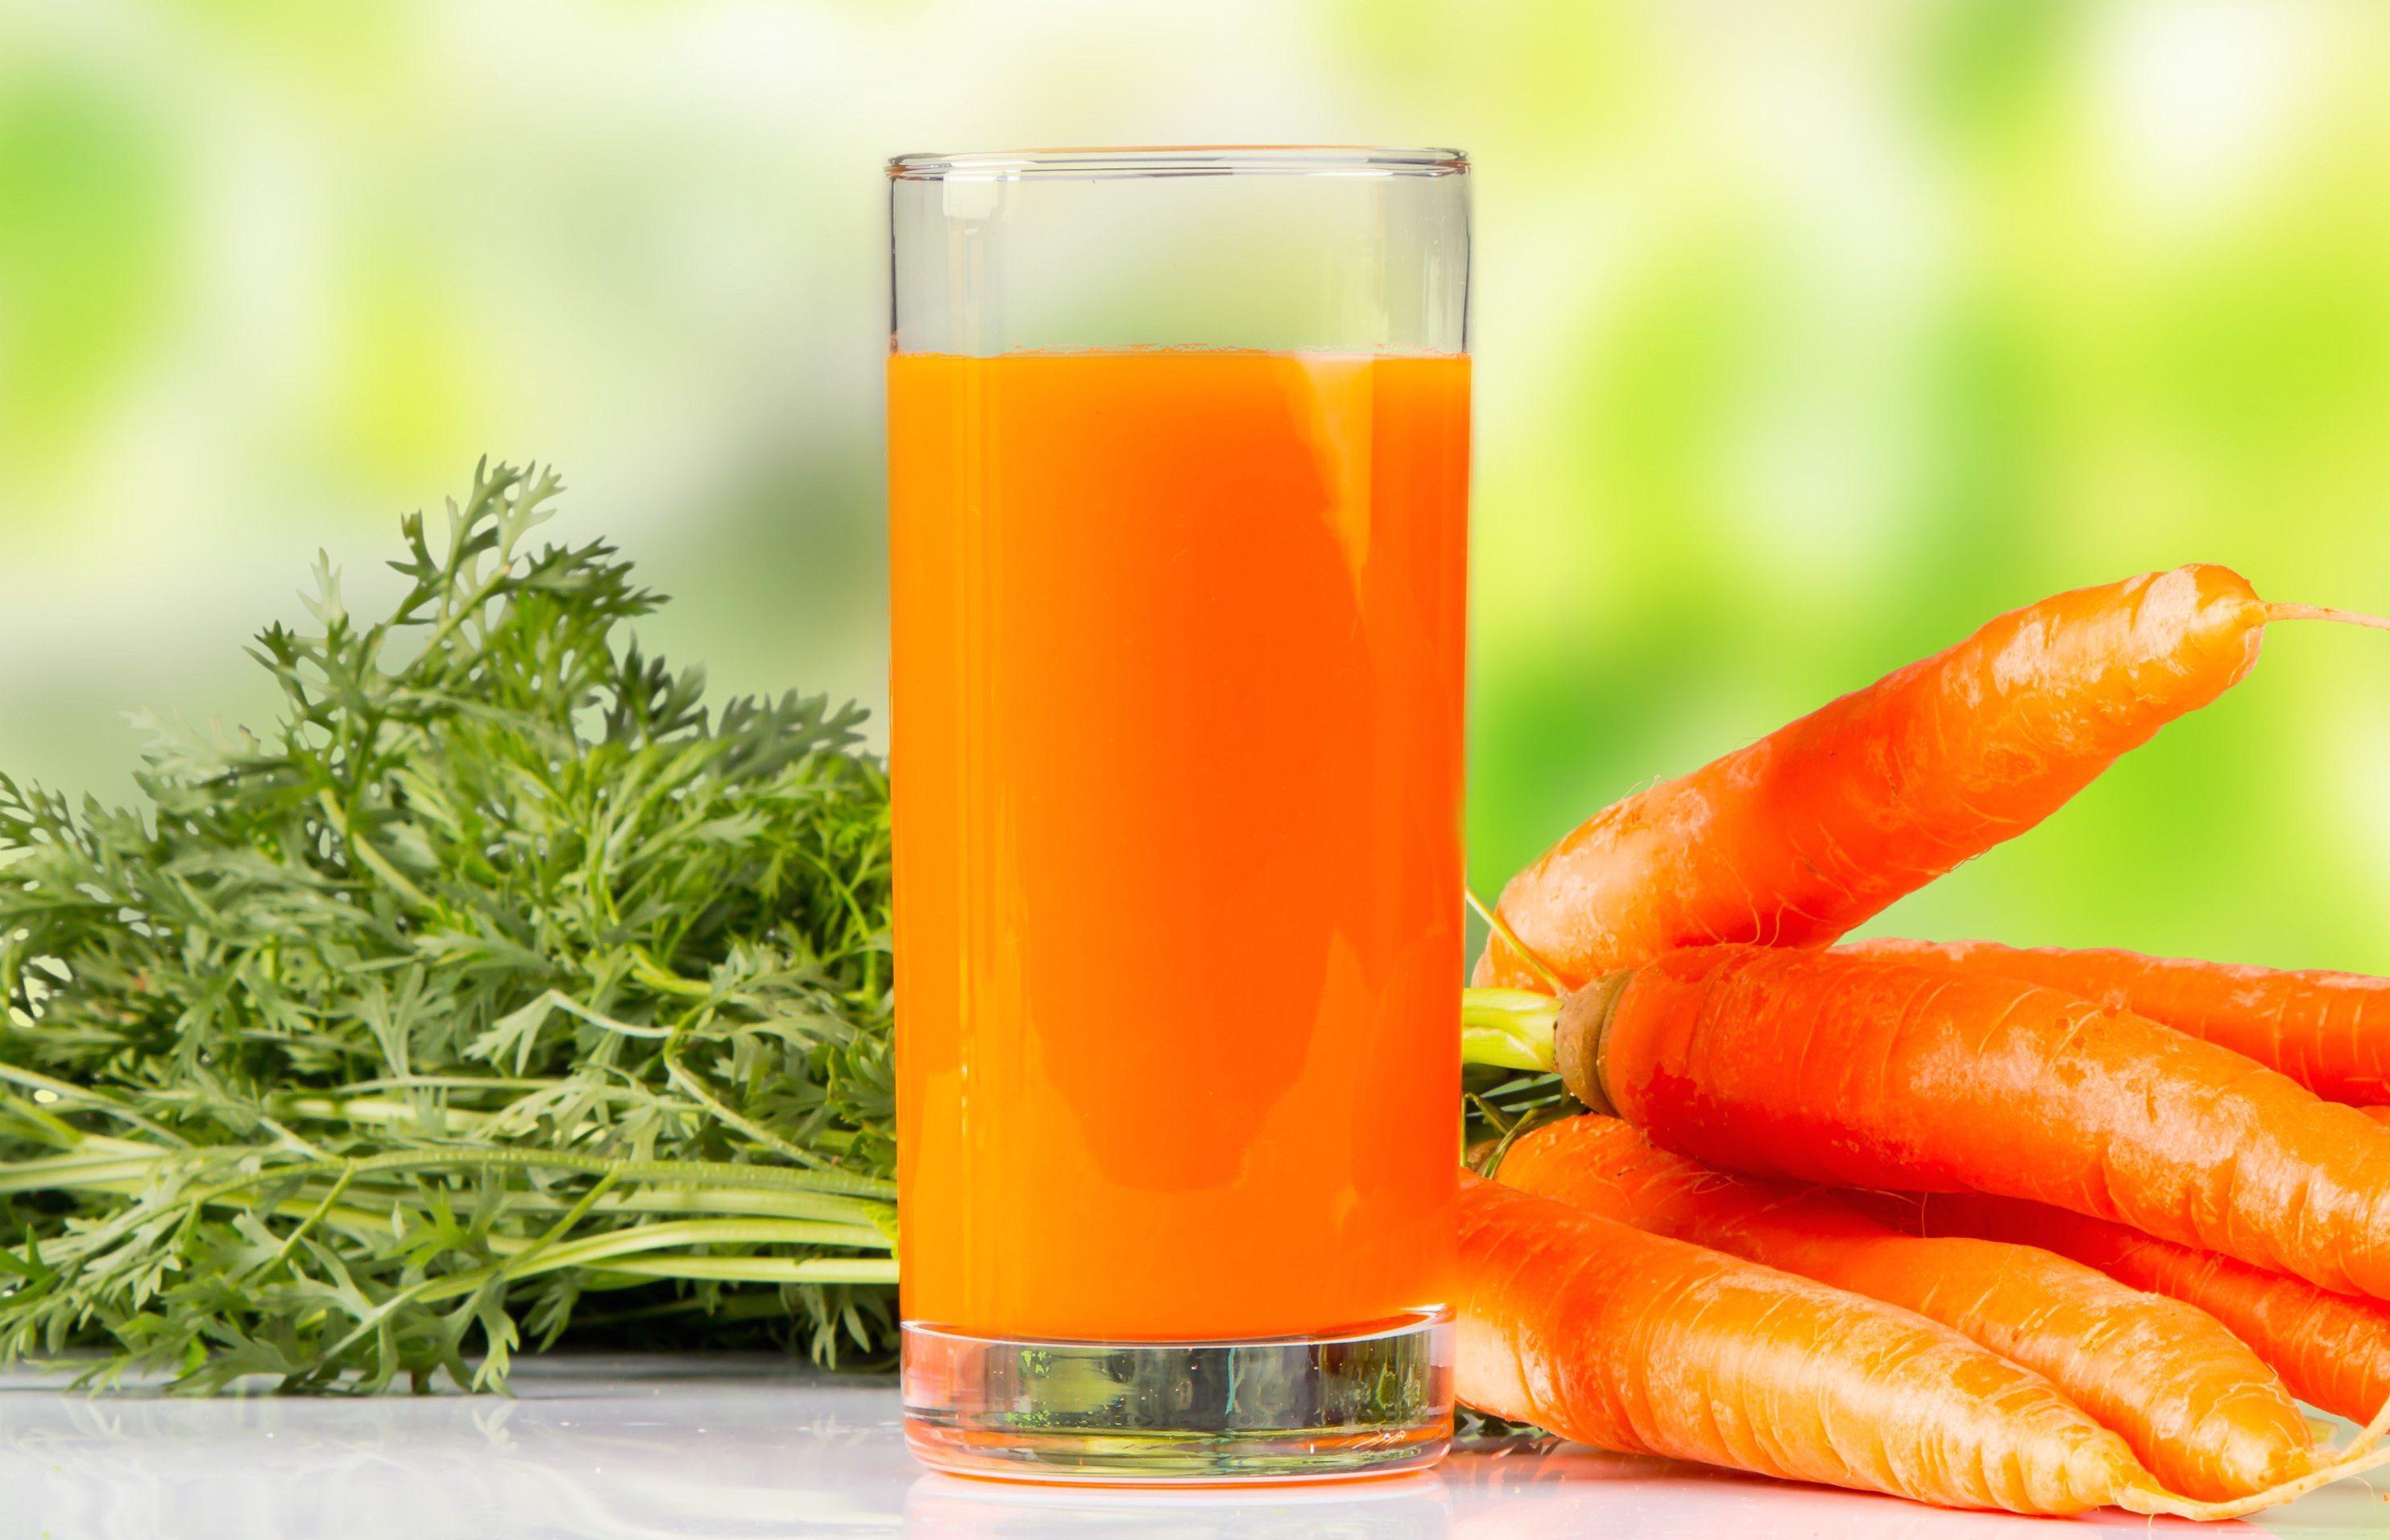 bronzeado cenoura